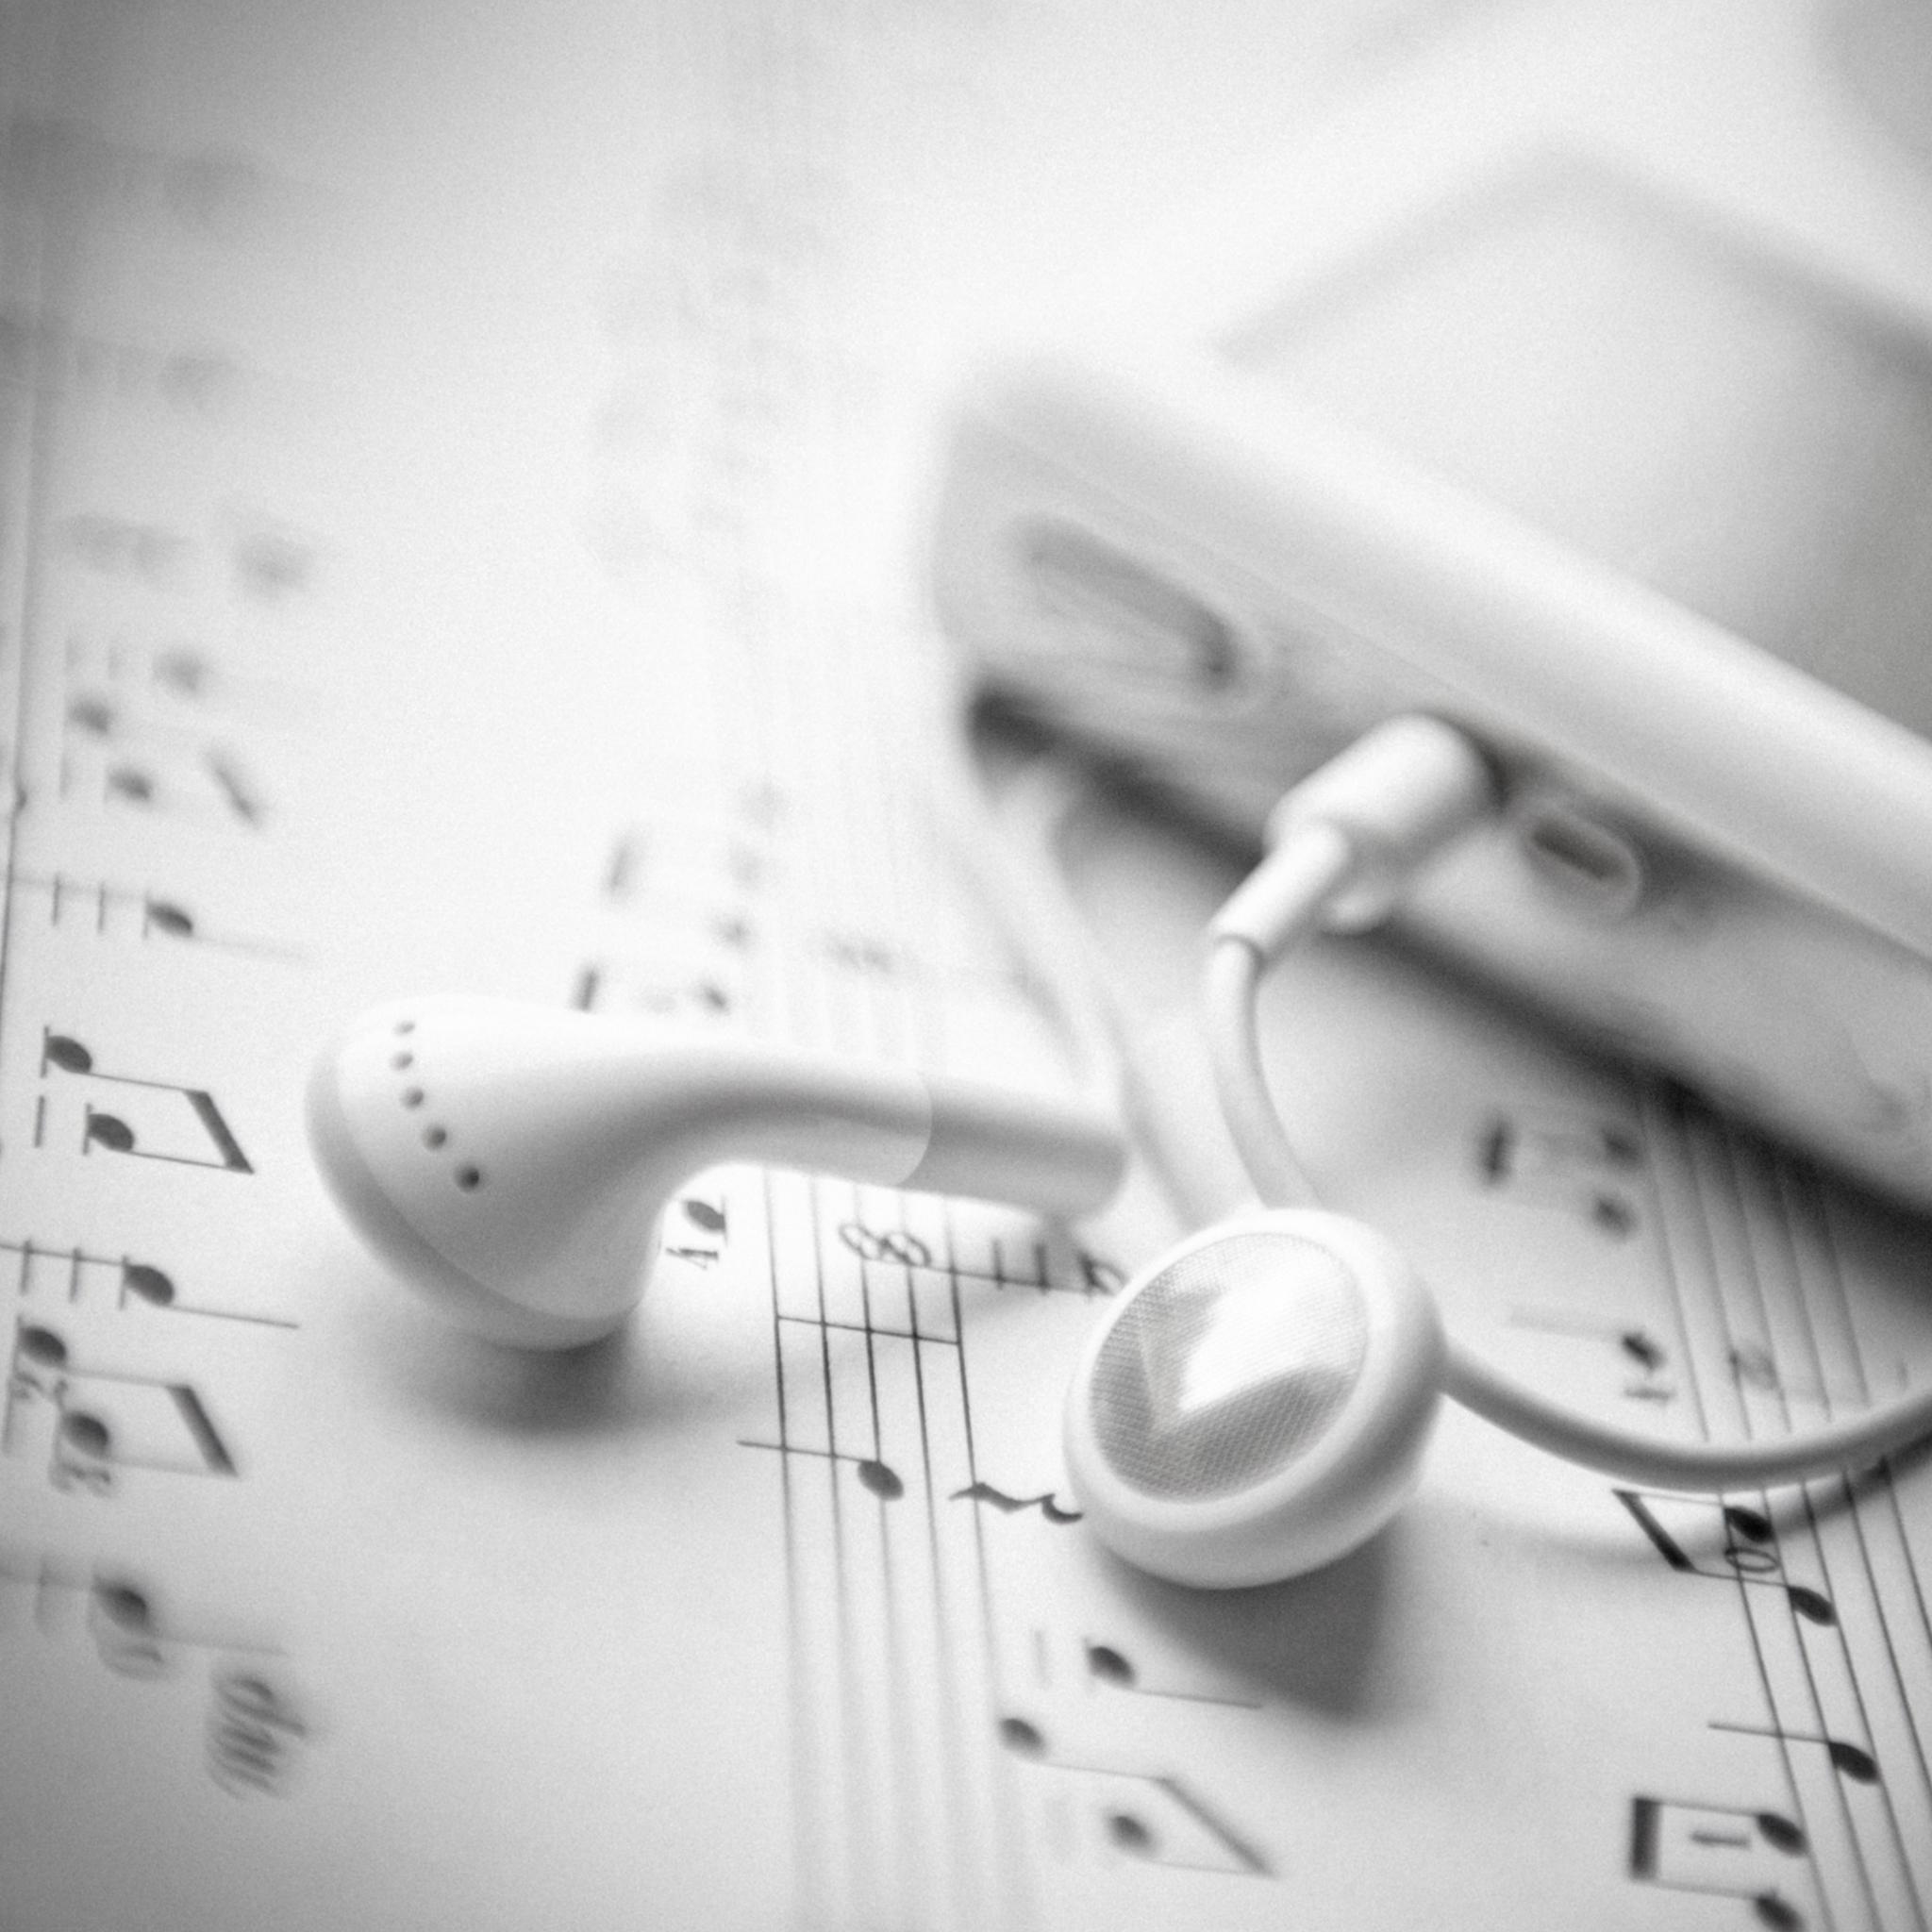 iPod-Music-3Wallpapers-iPad-Retina